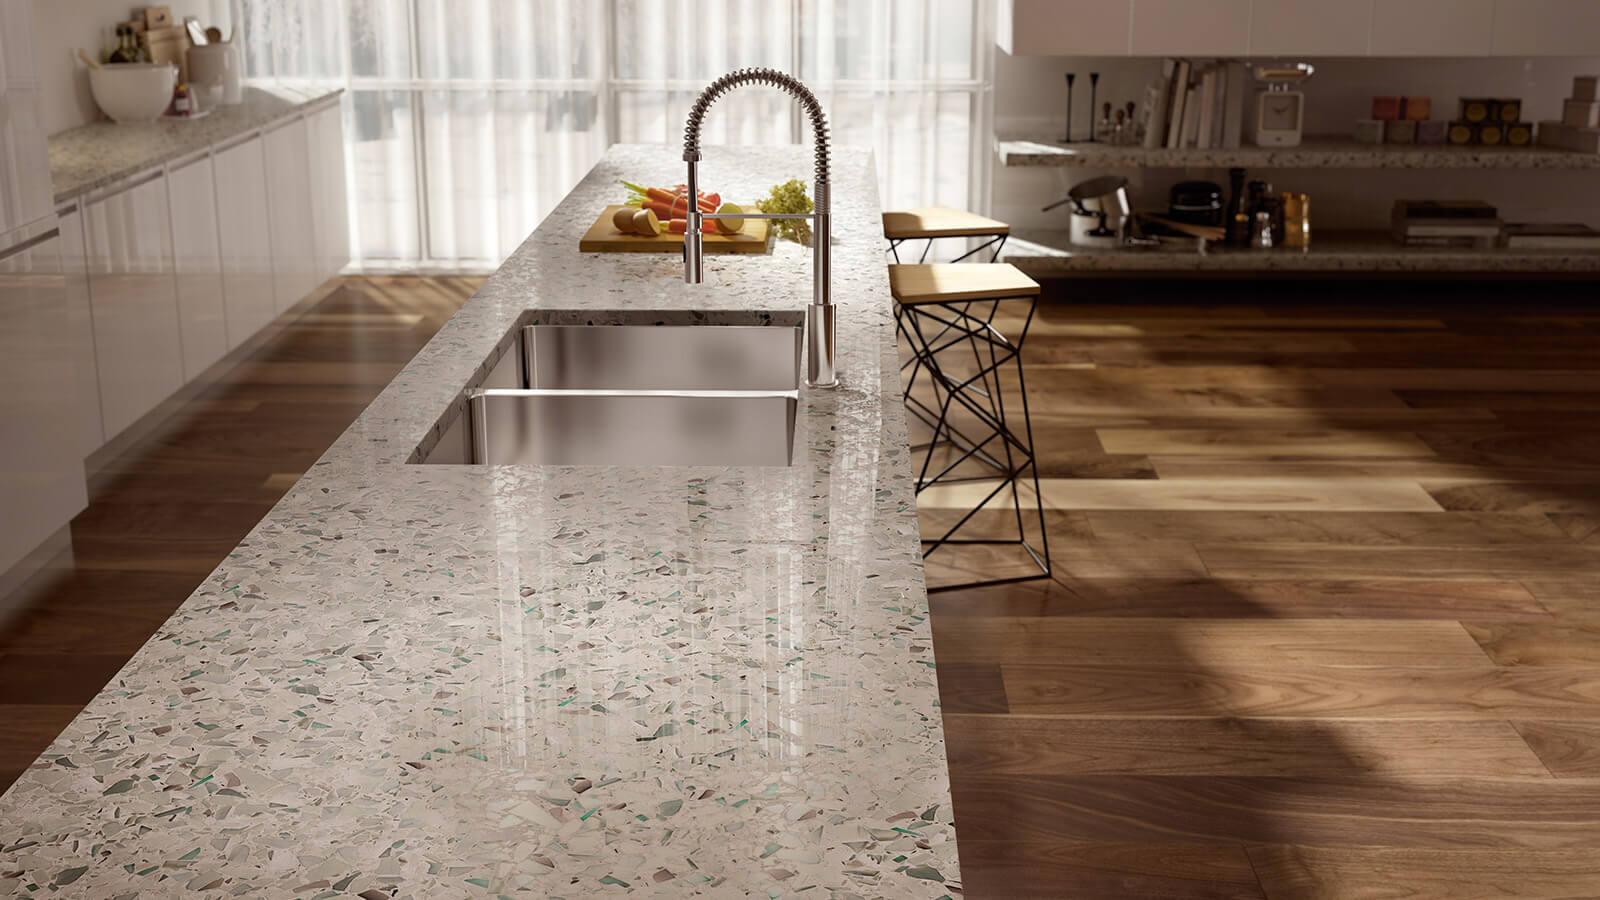 Vetrazzo Recycled Glass Countertops Mosaics Tiles